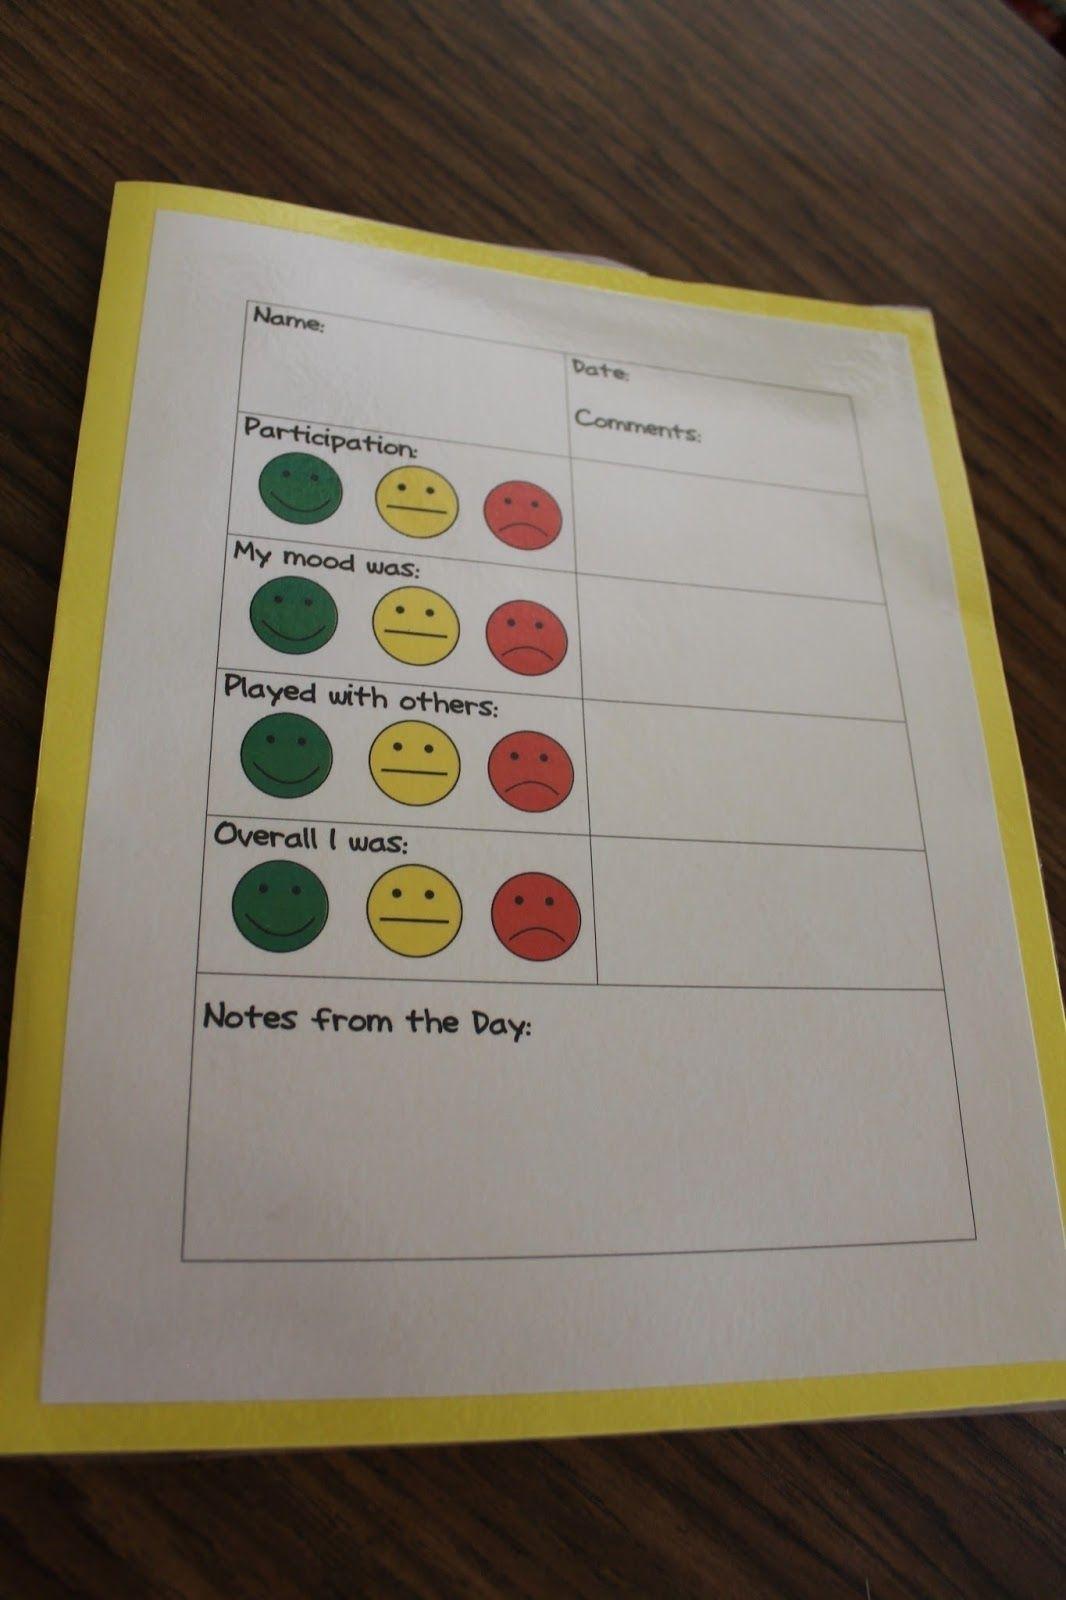 Apples 4 Bookworms: Play School | Behavior Management | Behavior with Conducut Chart For Play School